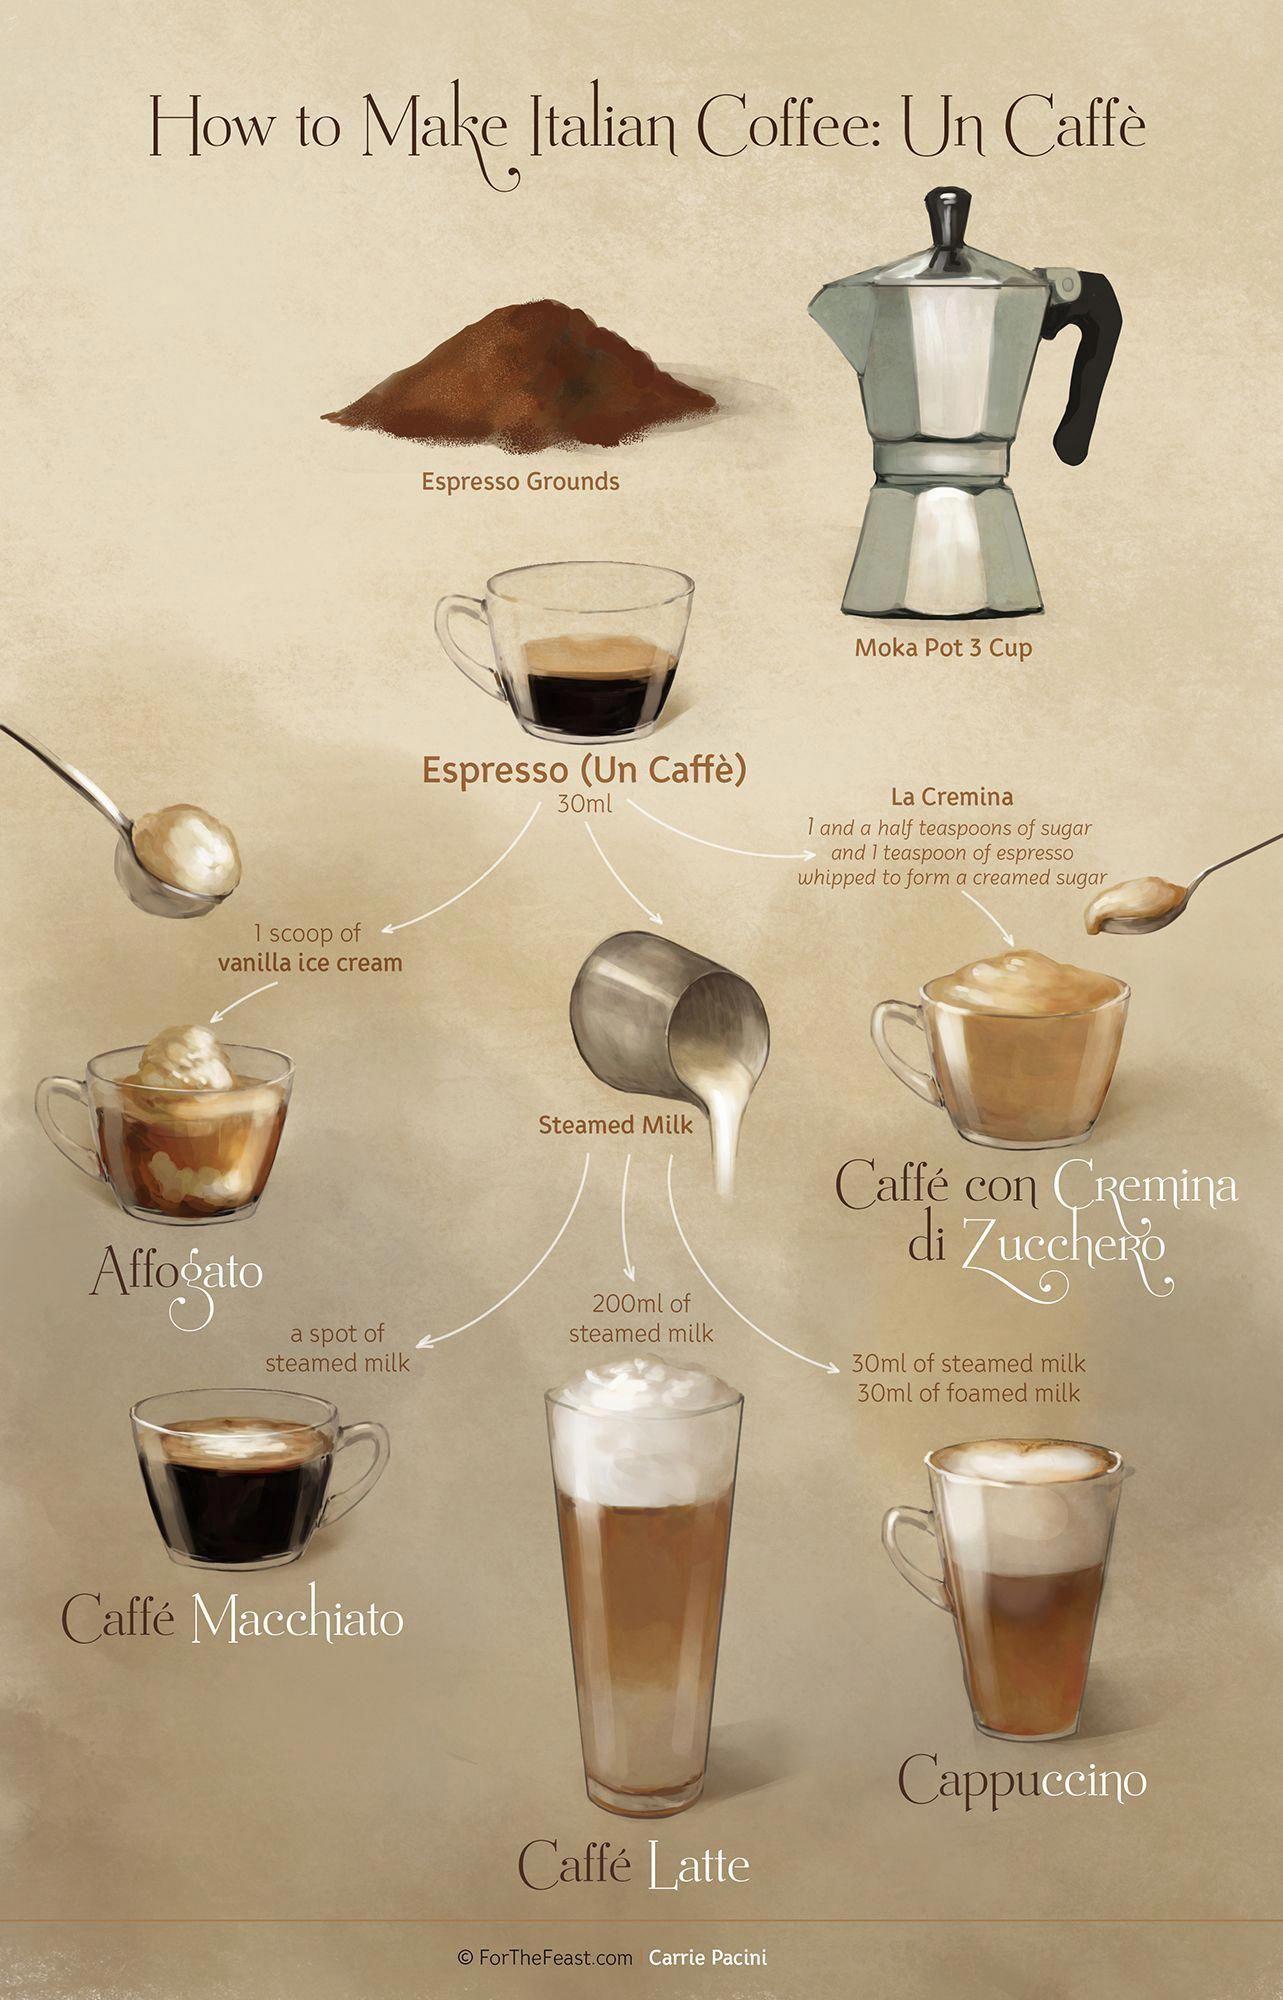 Coffee Comparison Coffeeareforclosers Chocolatecoveredcoffeebeans Coffee Lover Coffee Coffee Menu